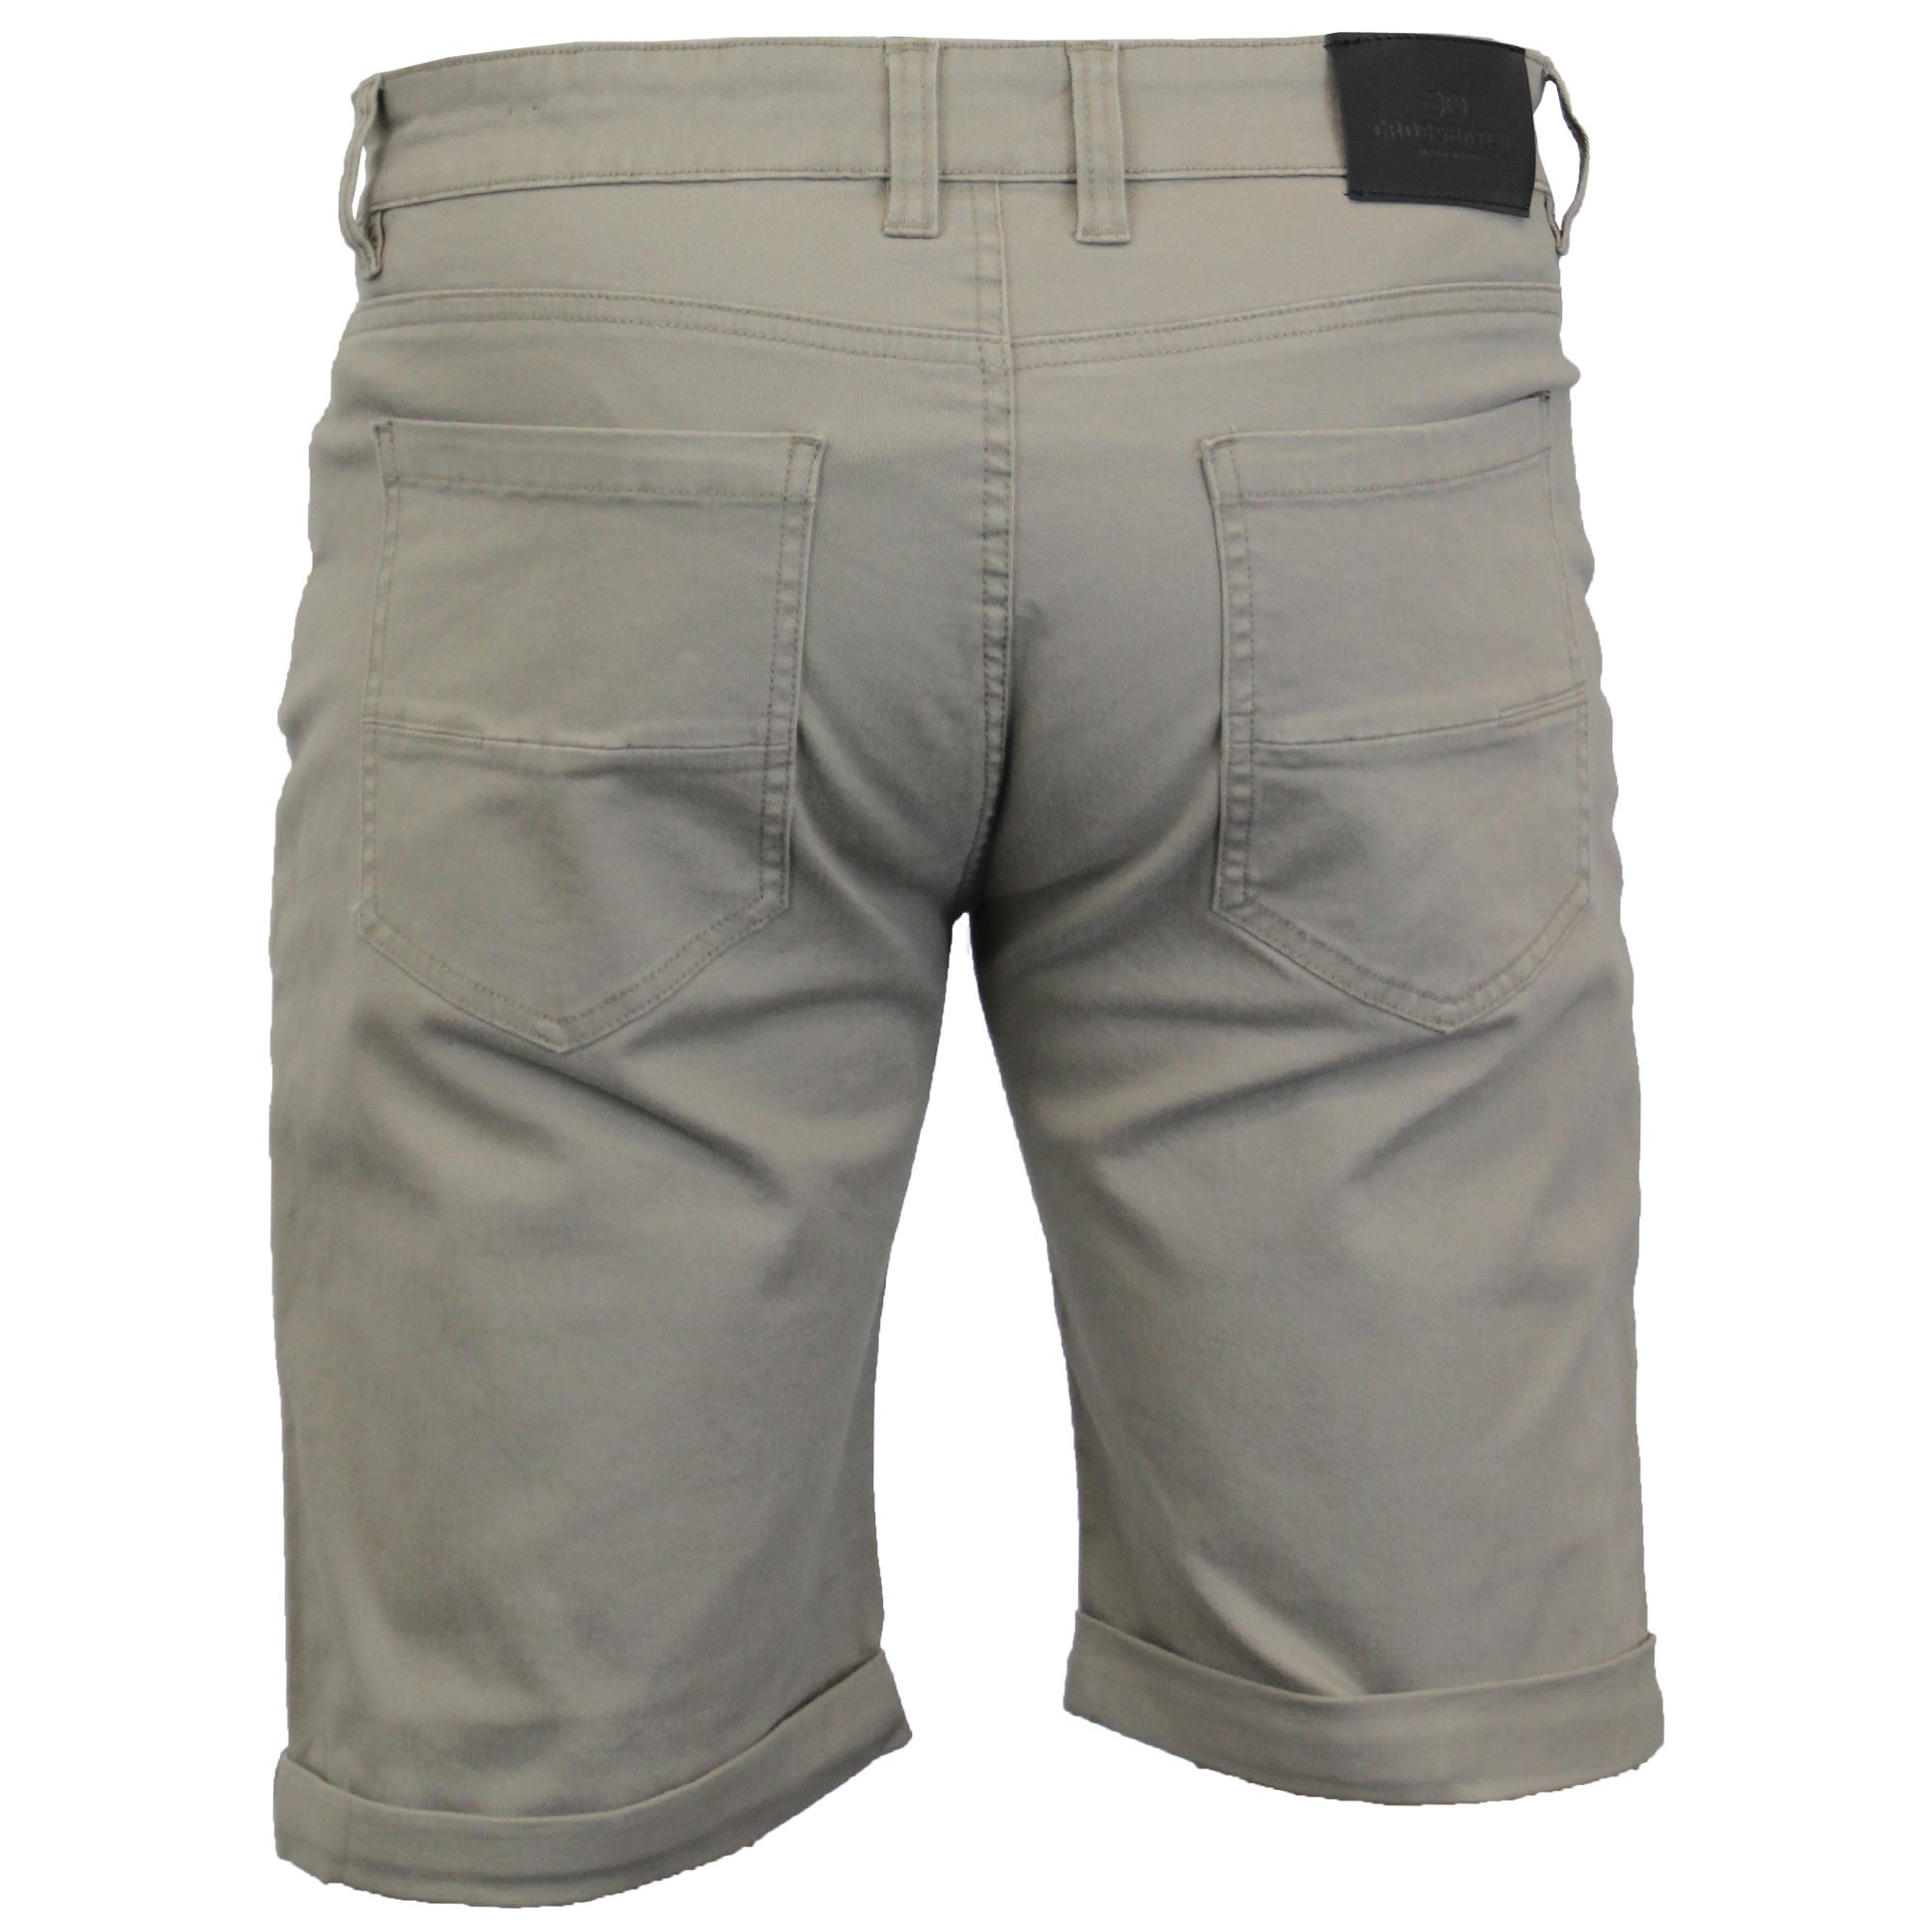 thumbnail 15 - Mens-Chino-Shorts-Crosshatch-Brandons-Knee-Length-Fastrack-Roll-Up-Summer-New